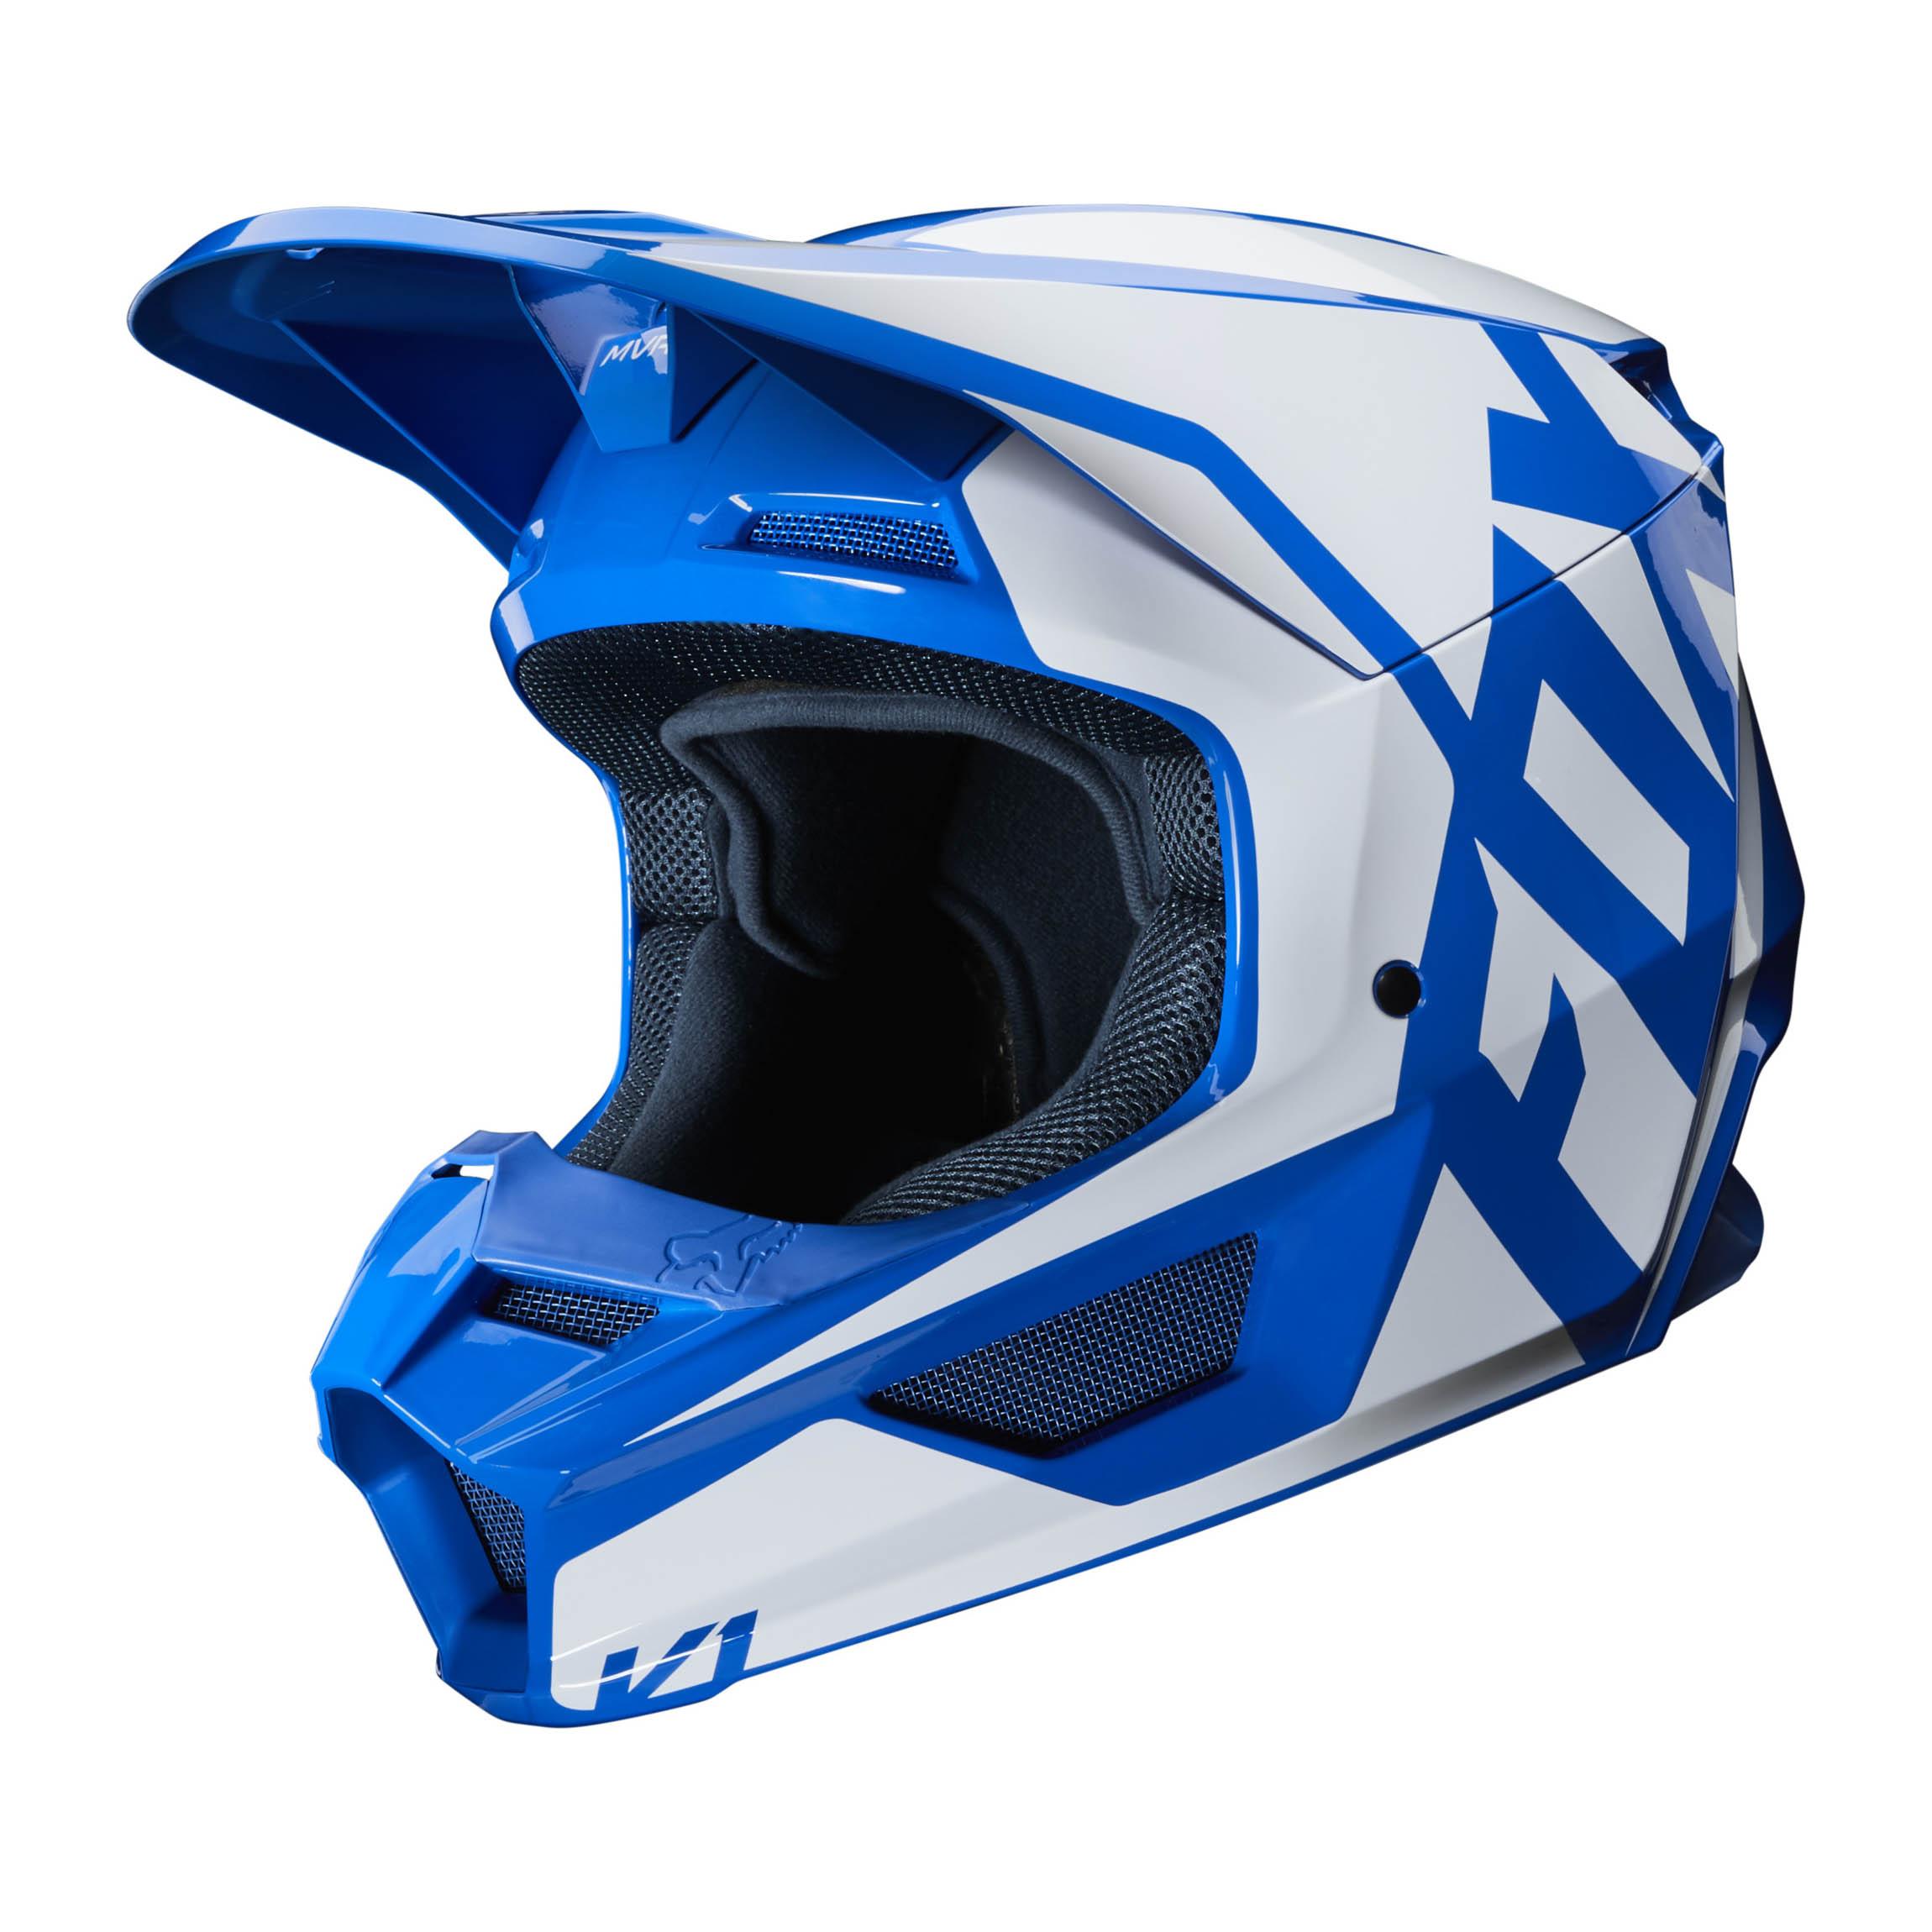 Helm Schlüsselanhänger Roller-Helm Motorrad Biker